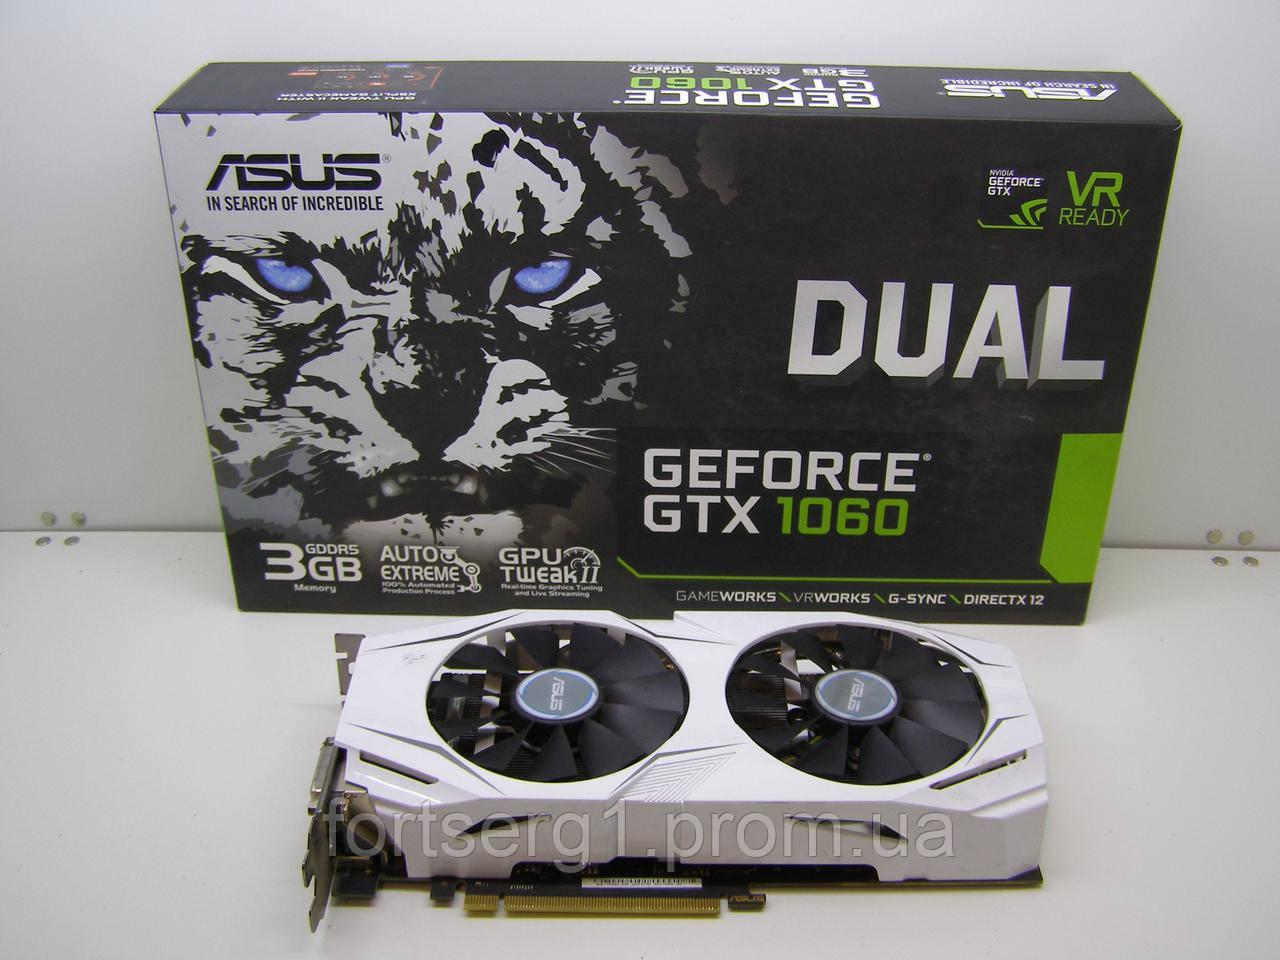 Видеокарта Asus PCI-Ex GeForce GTX 1060 Dual 3GB GDDR5 (192bit) (1569 d4fbfd3595d1d